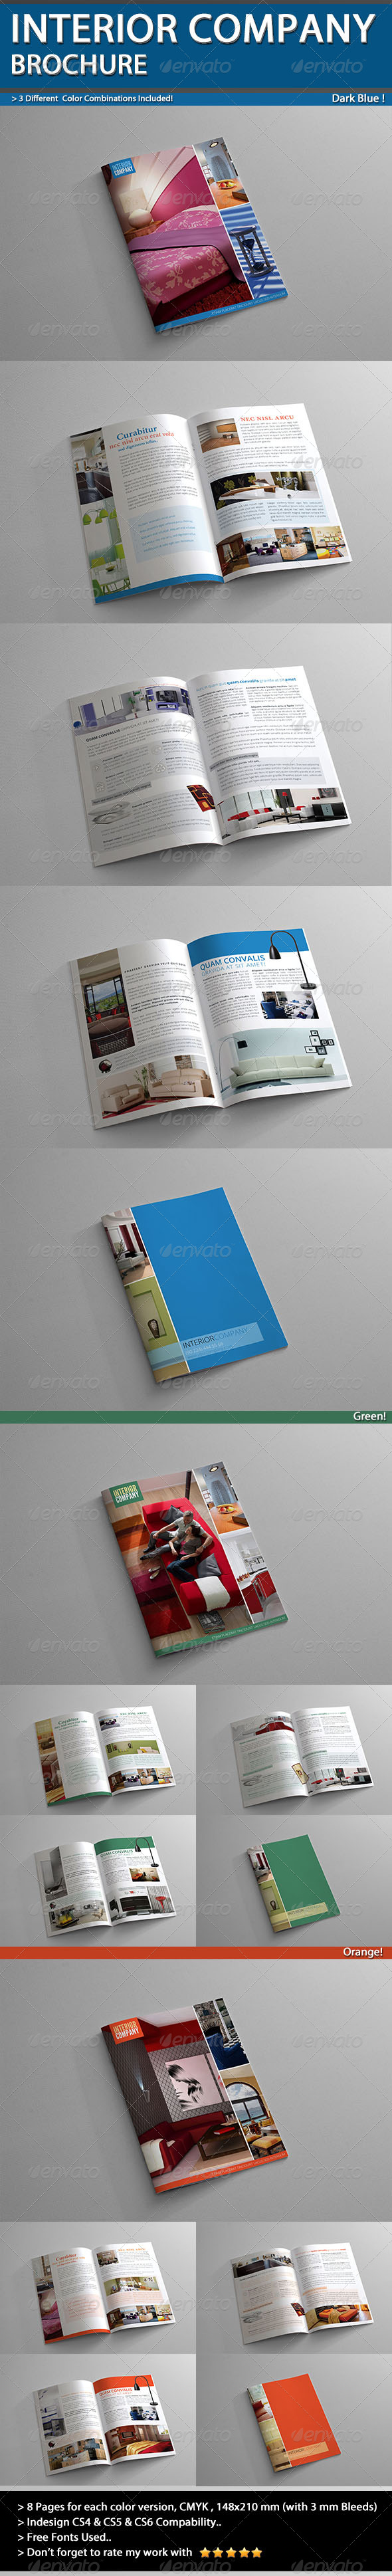 Interior Company Brochure A5 V01 - Catalogs Brochures